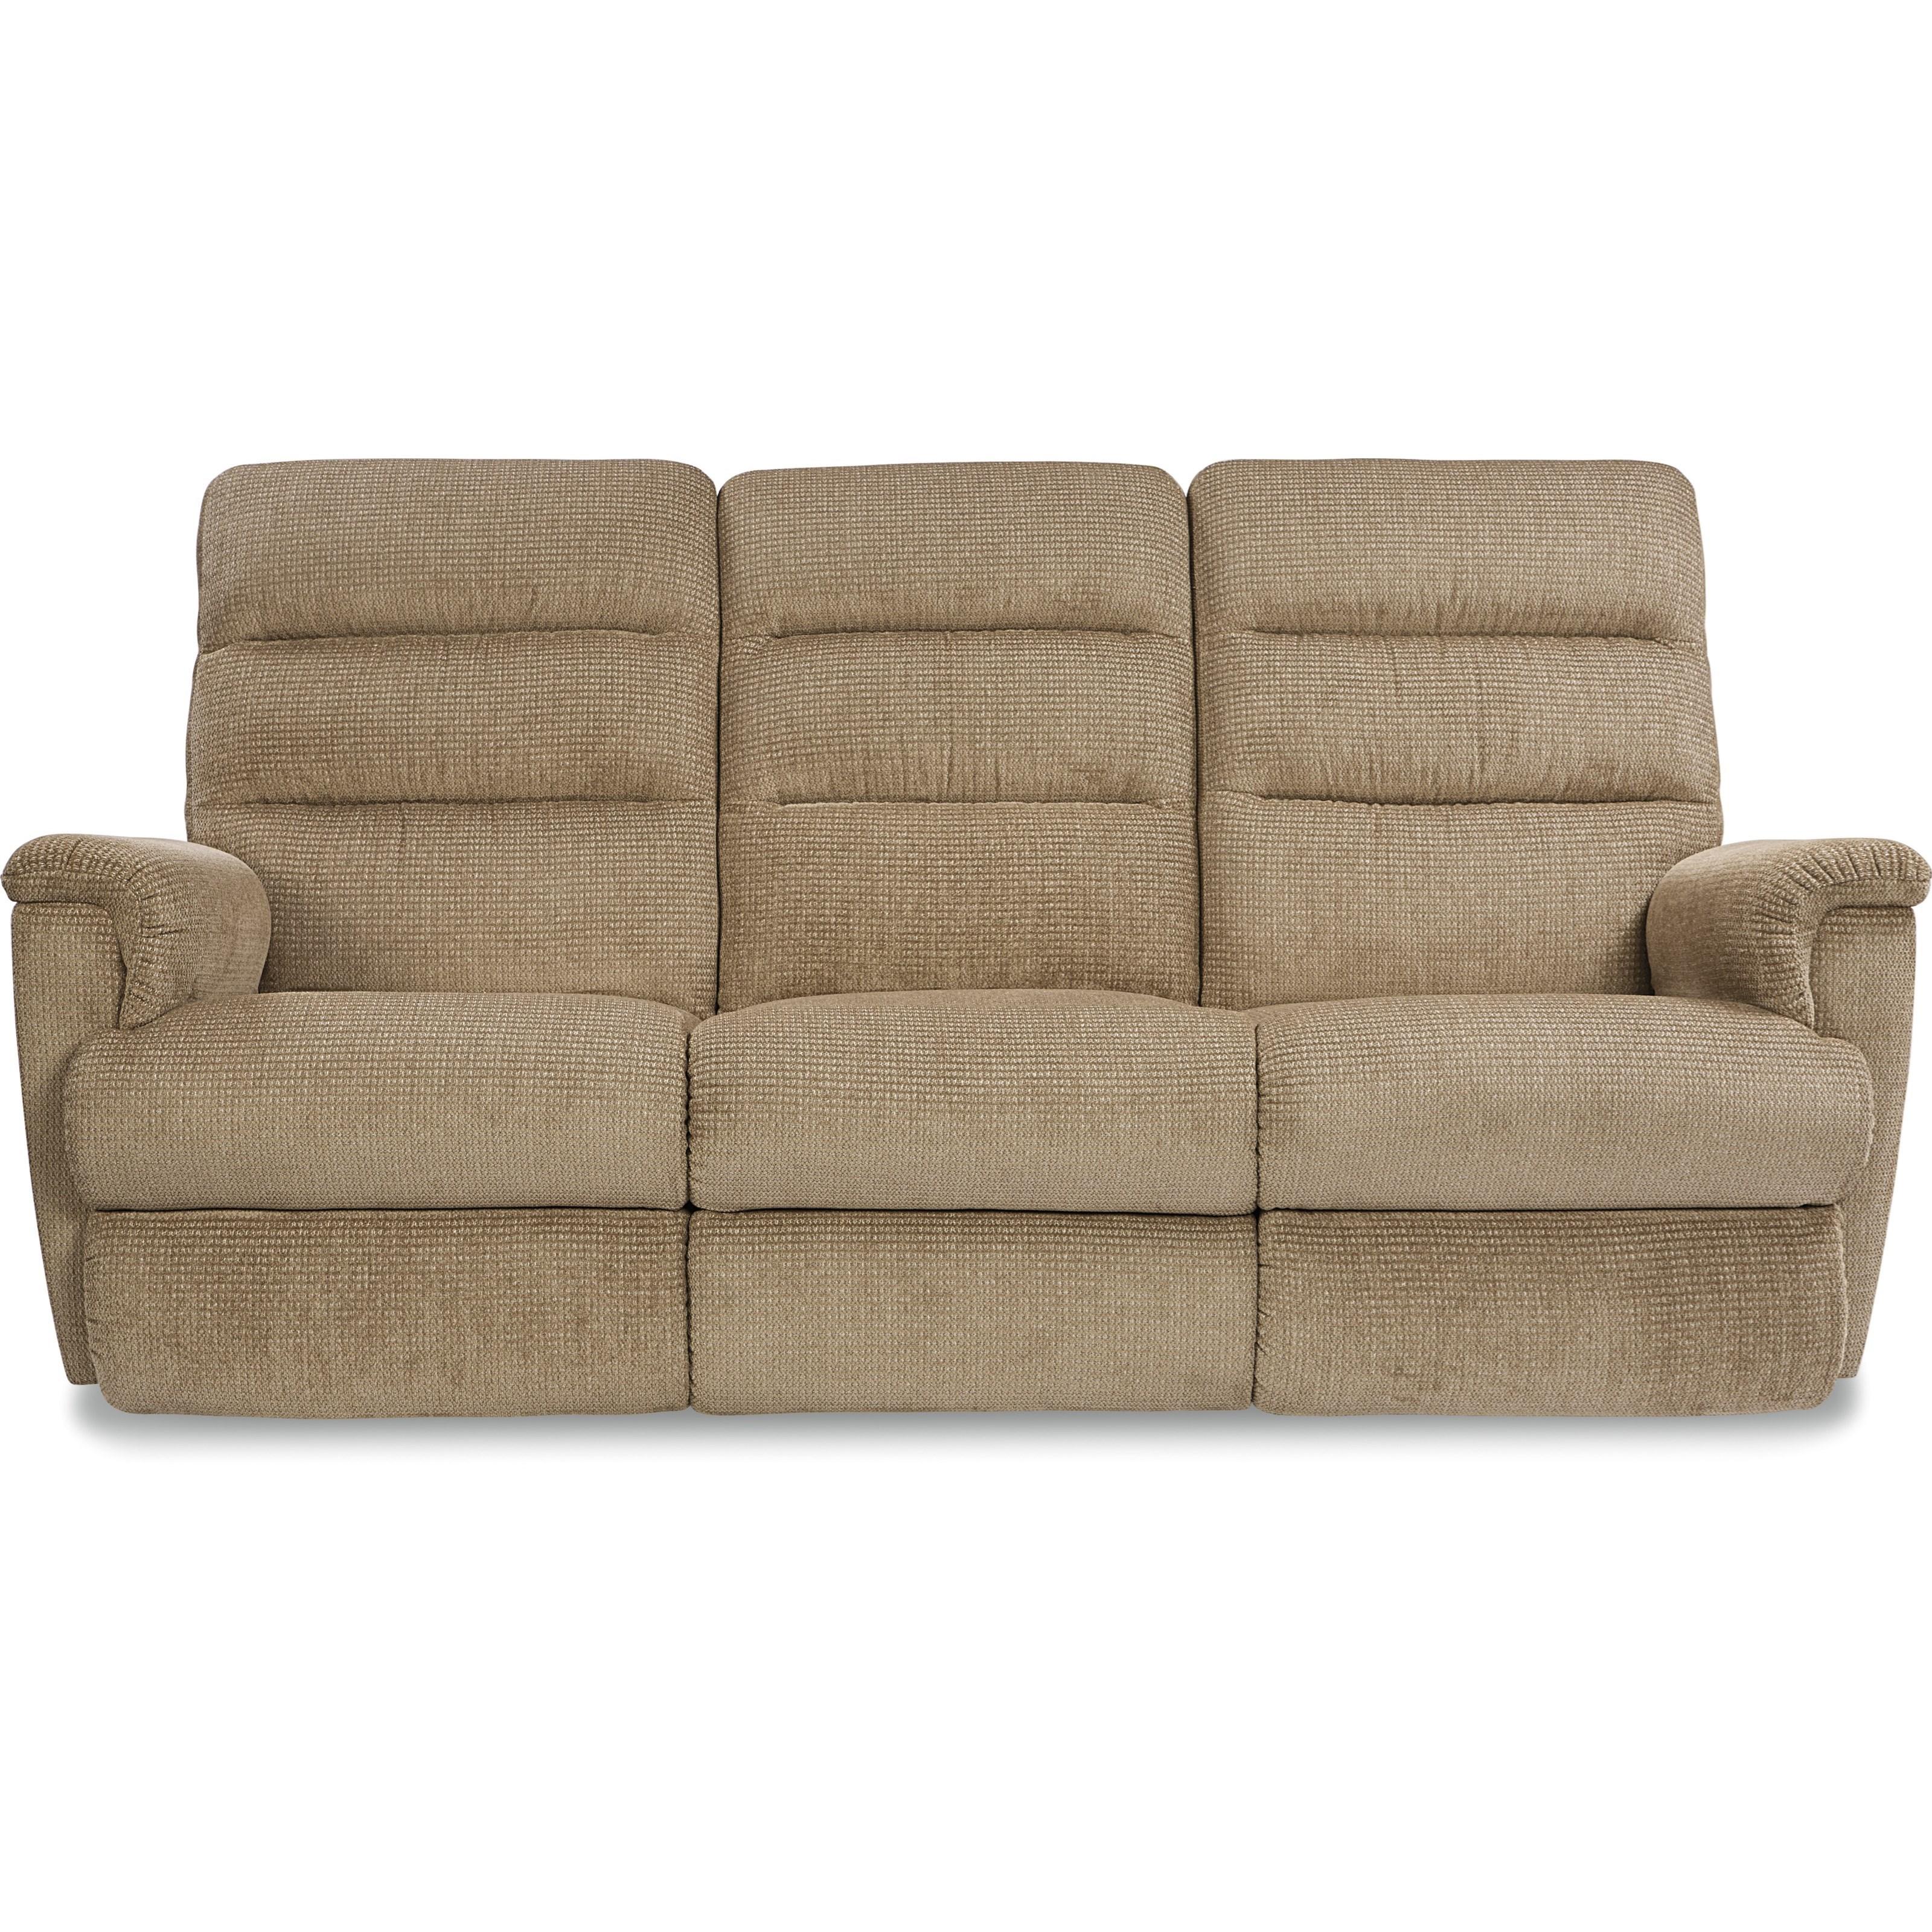 cream colored microfiber sofa antique french provincial and chair la z boy tripoli casual power recline xrw wall saver